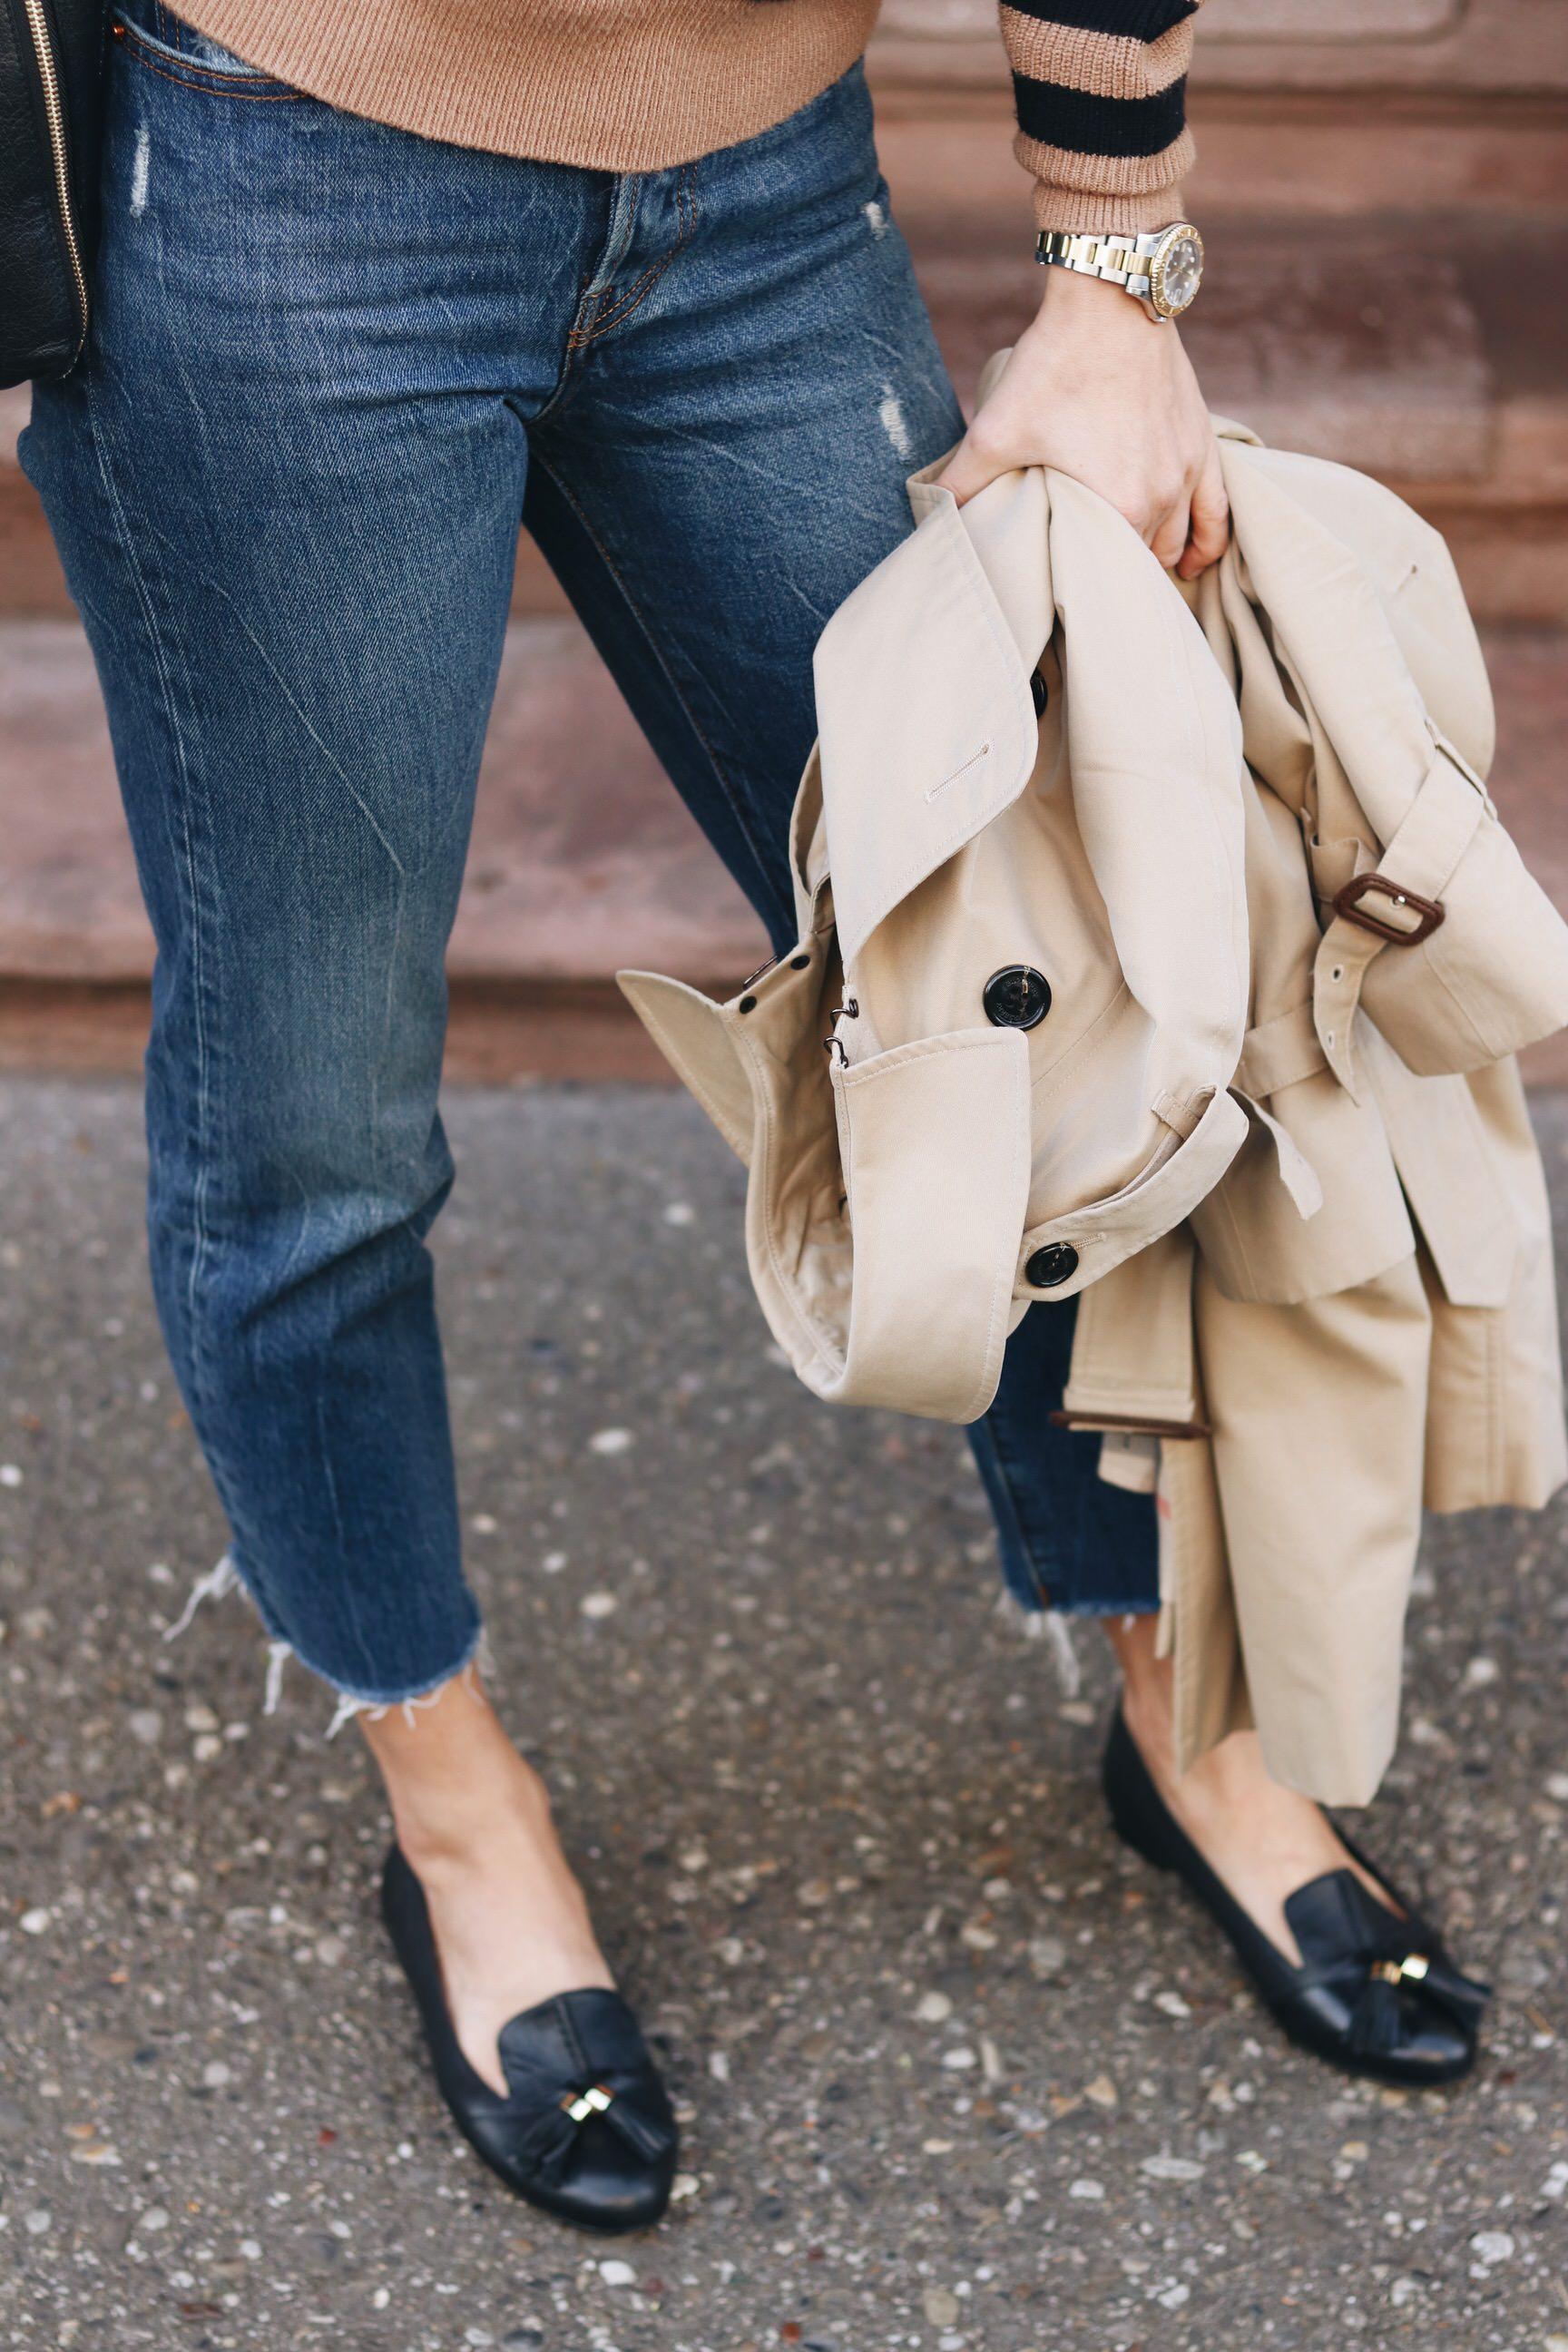 Loafer kombinieren Herbst Look Outfit Blog Modeblog